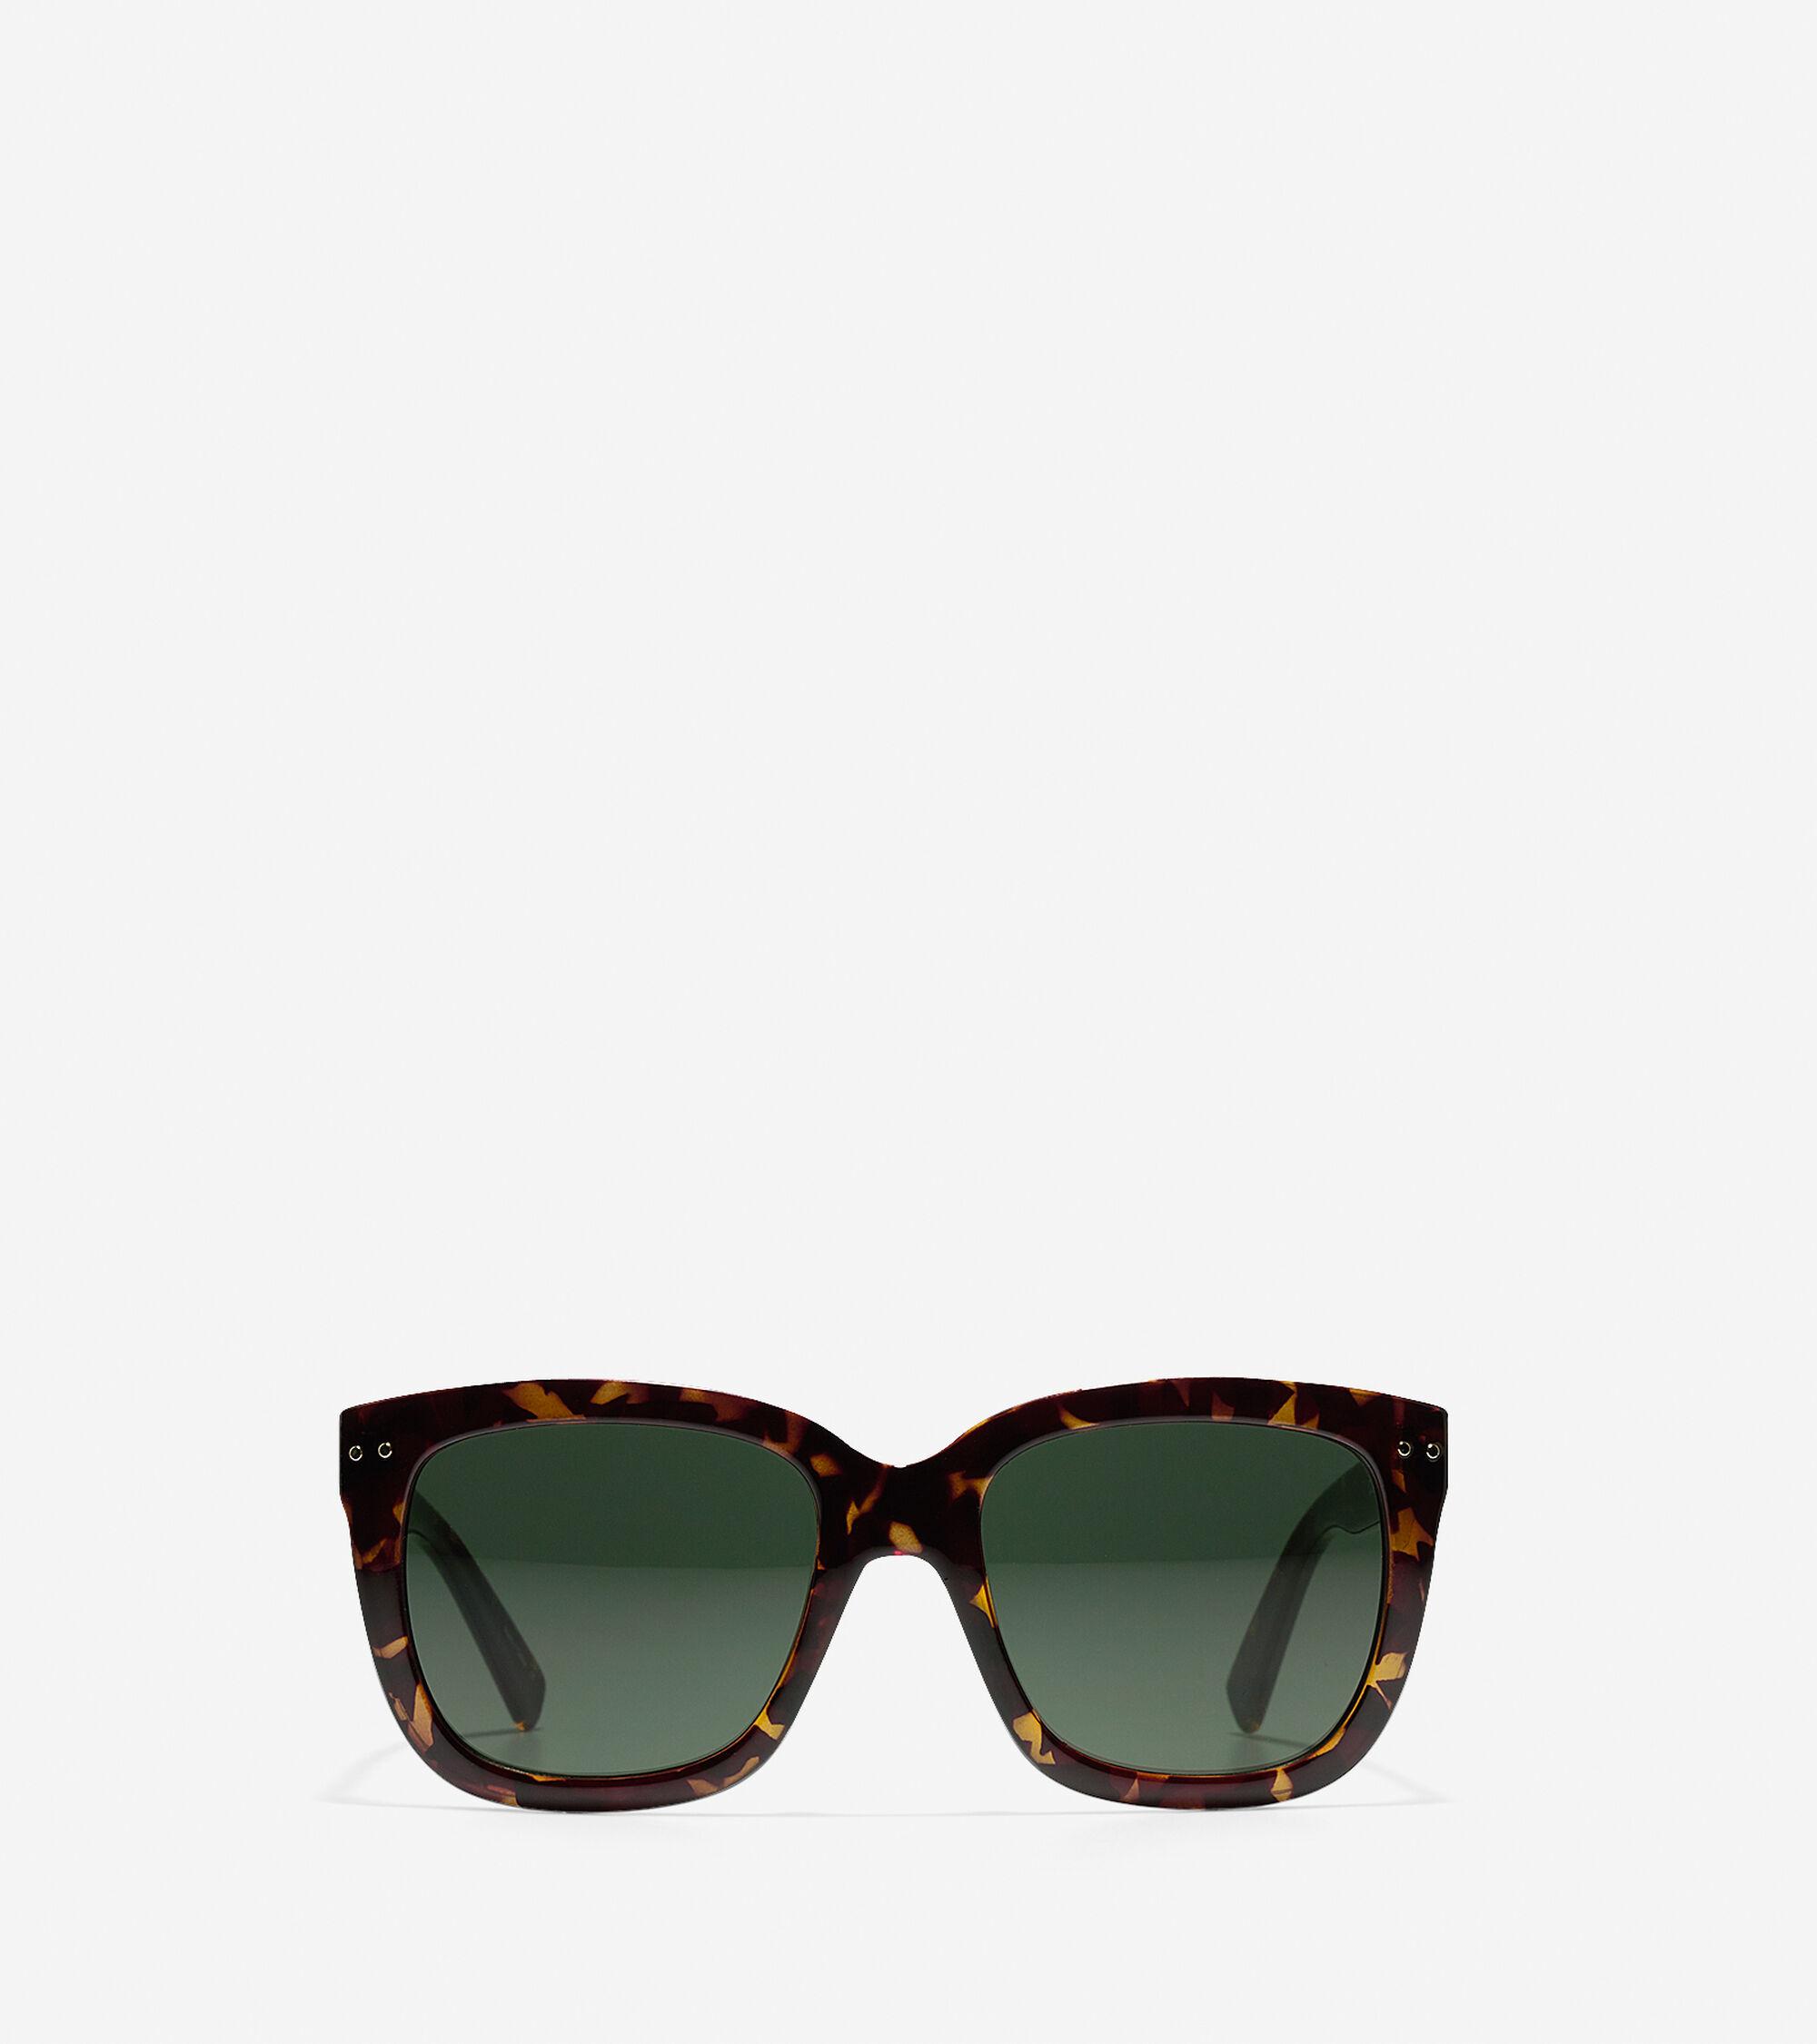 Accessories > Modified Rectangle Sunglasses